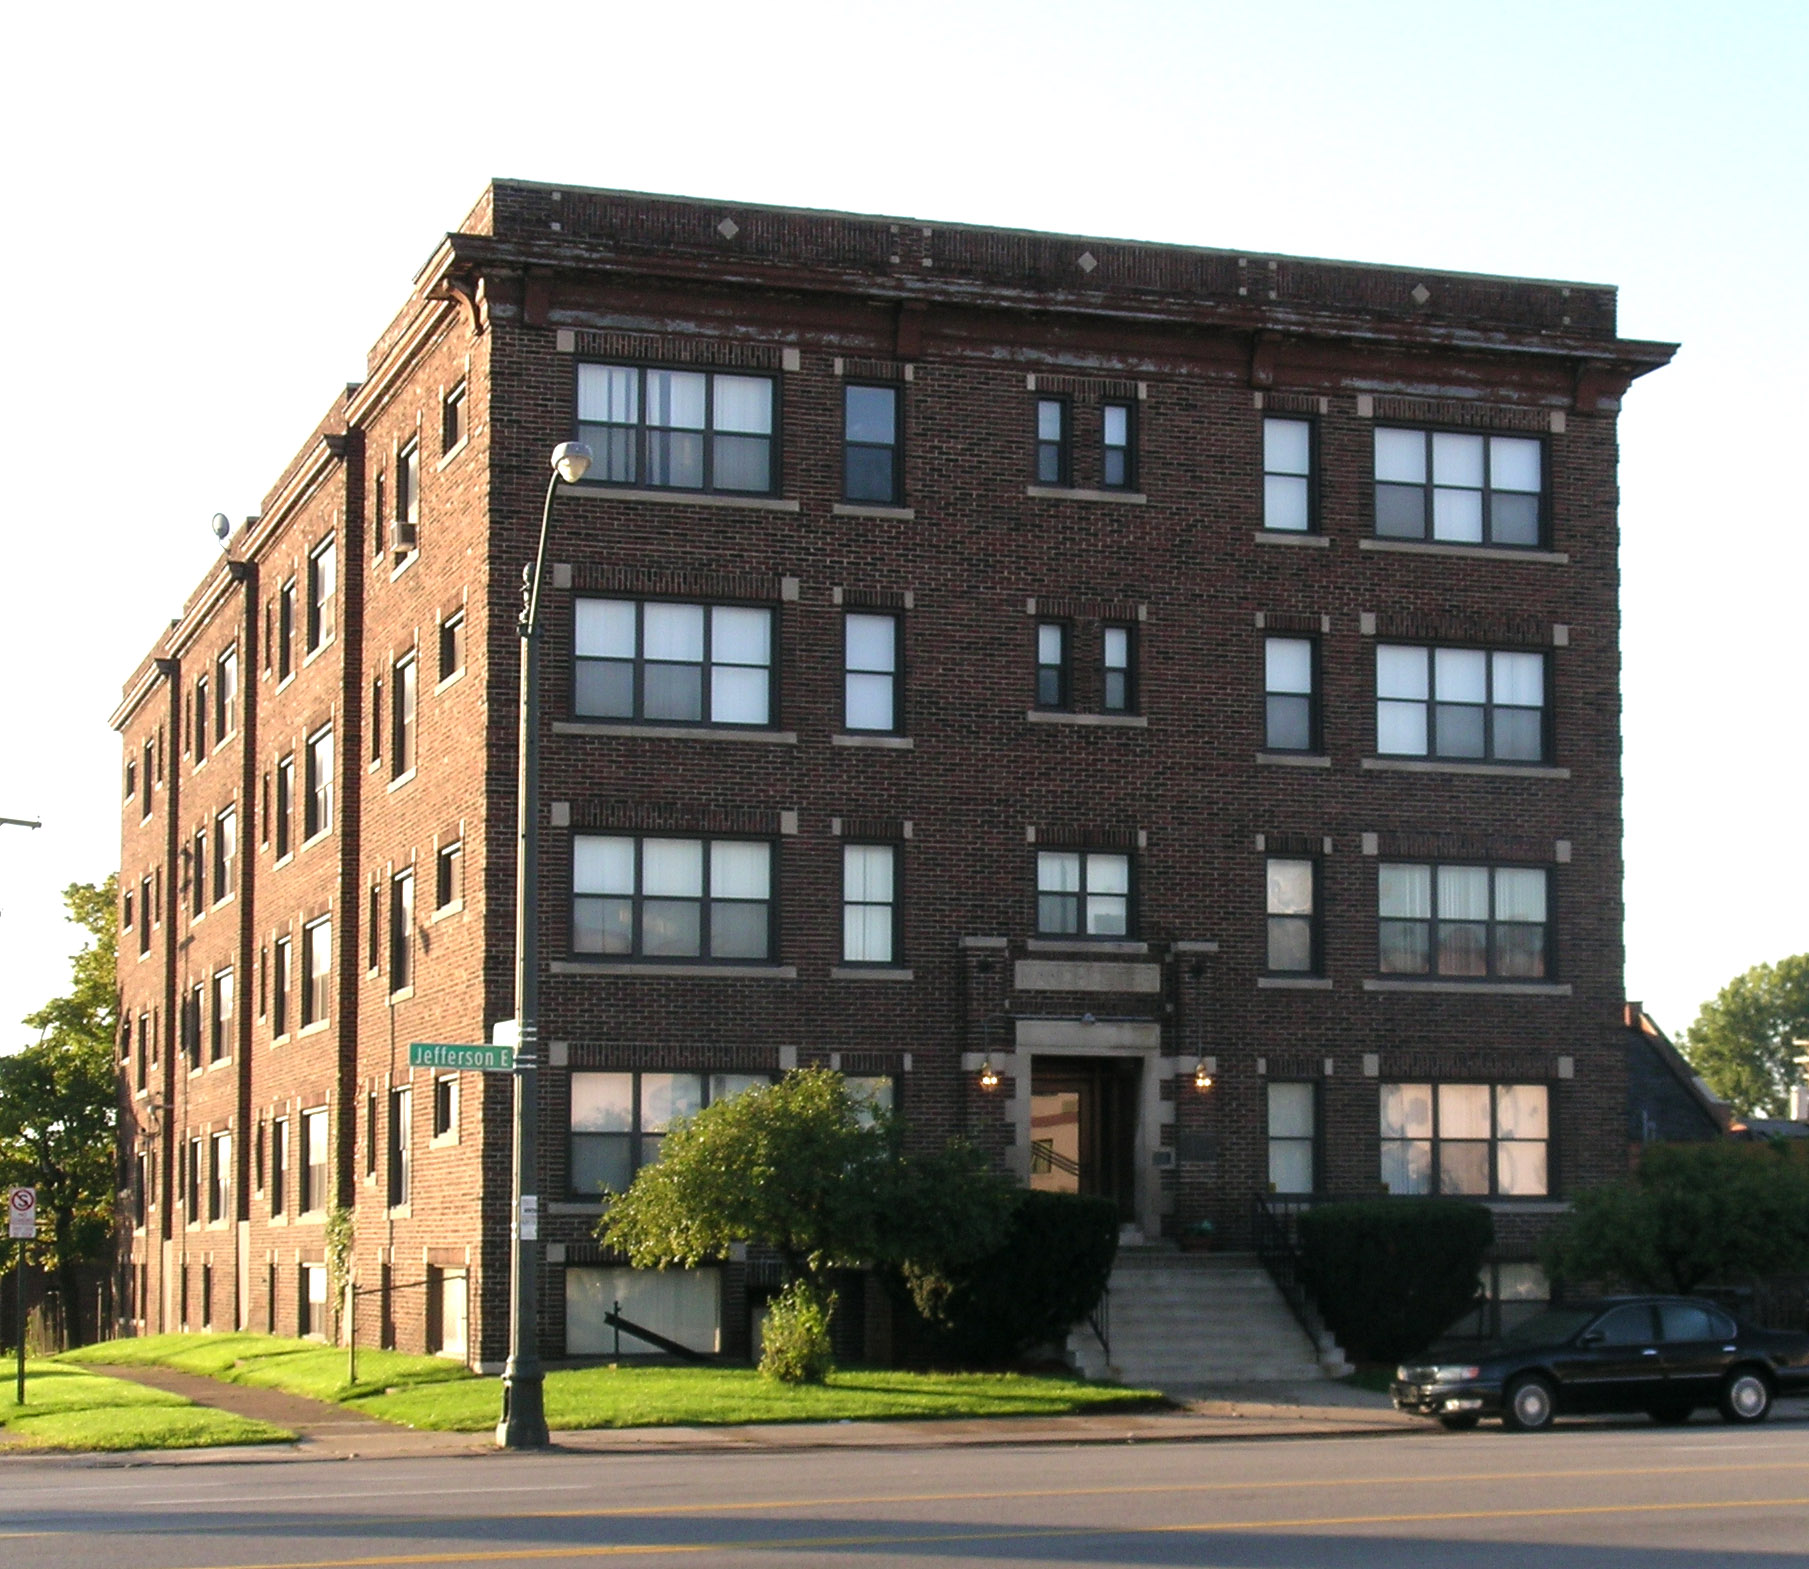 Apartments In Michigan: Manchester Apartments (Detroit, Michigan)